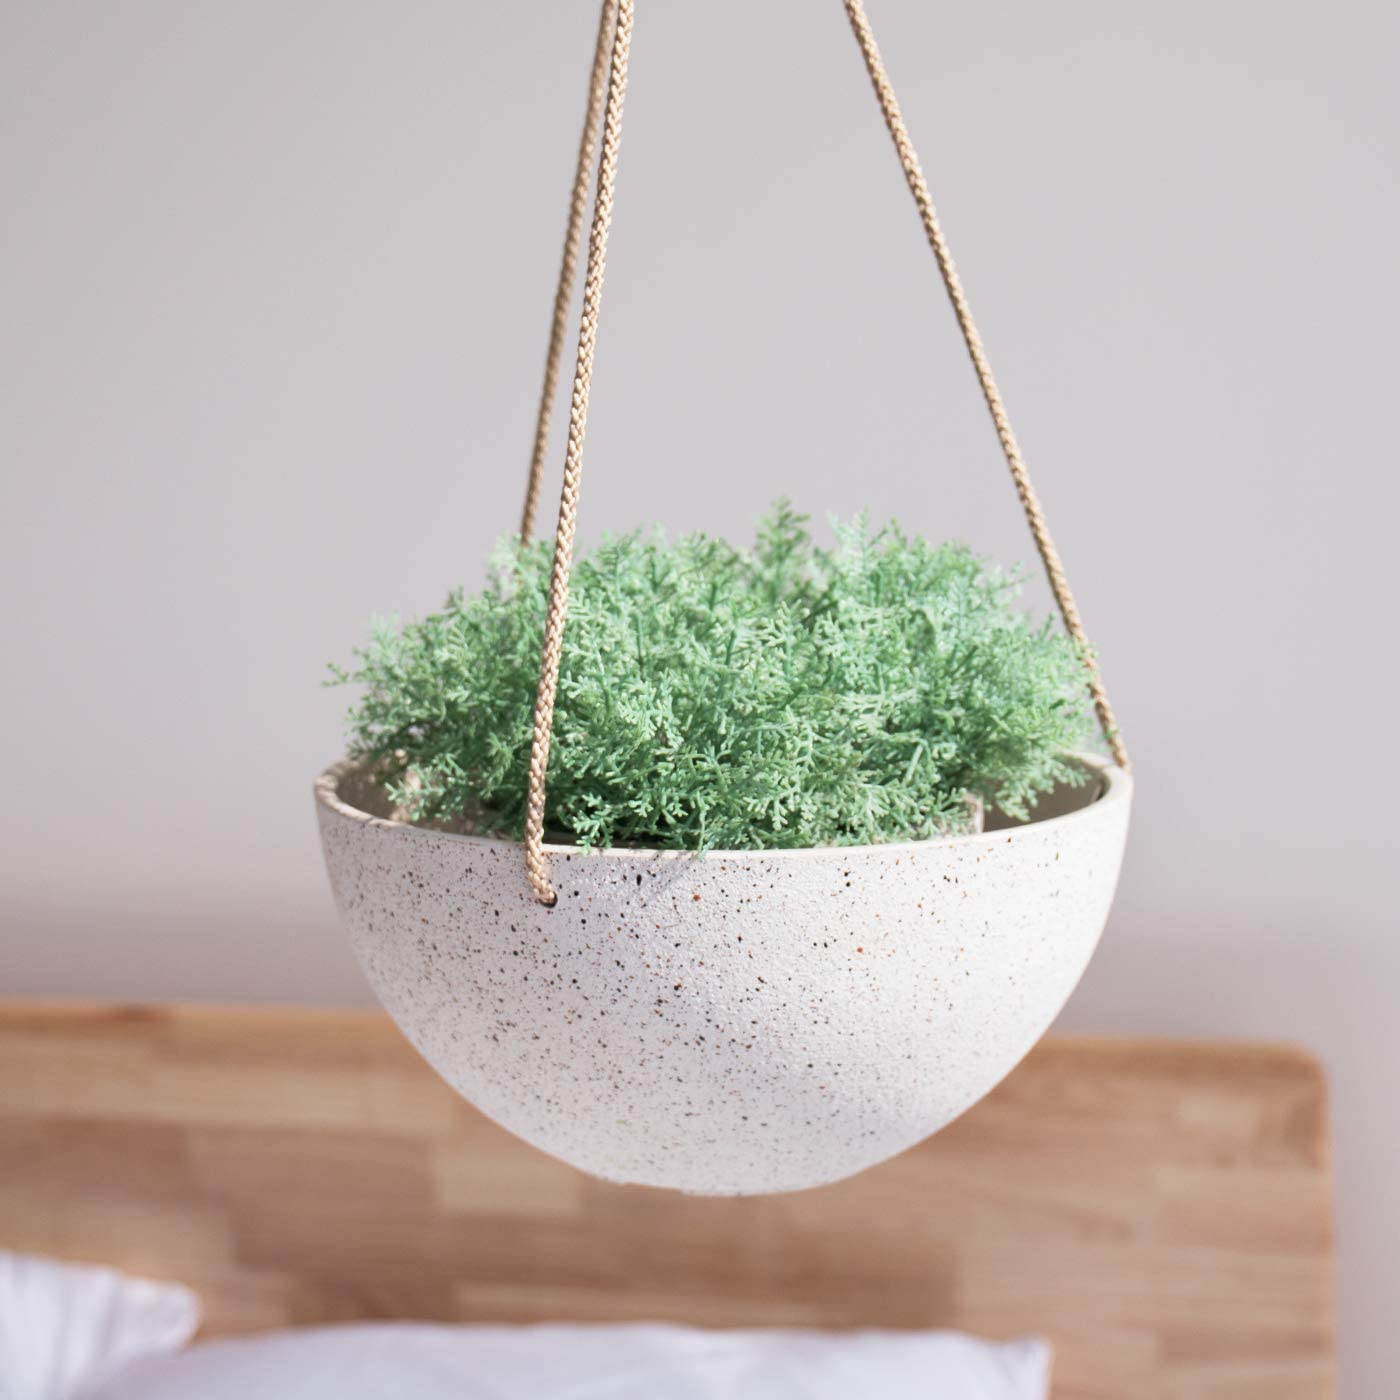 Greenhouse 6 Inch Pots Flower Herb Fern Perennial Growing Gardening Qty 10